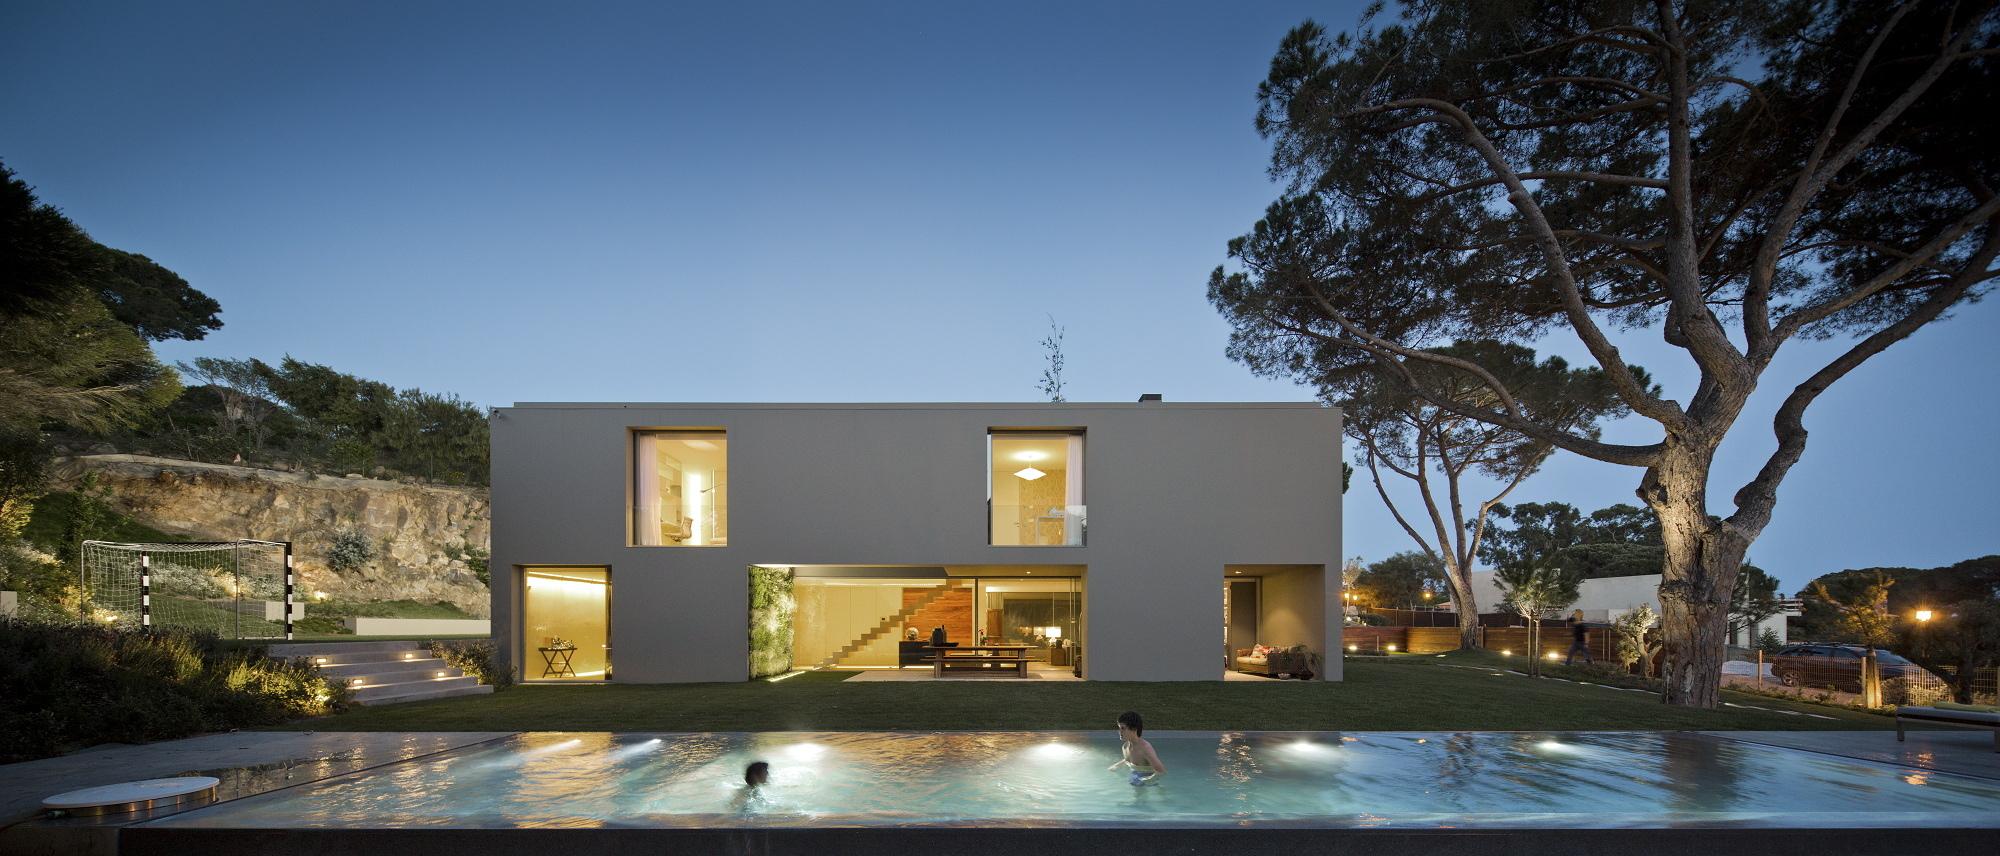 House in Quinta Patino / Frederico Valsassina Arquitectos, © FG+SG